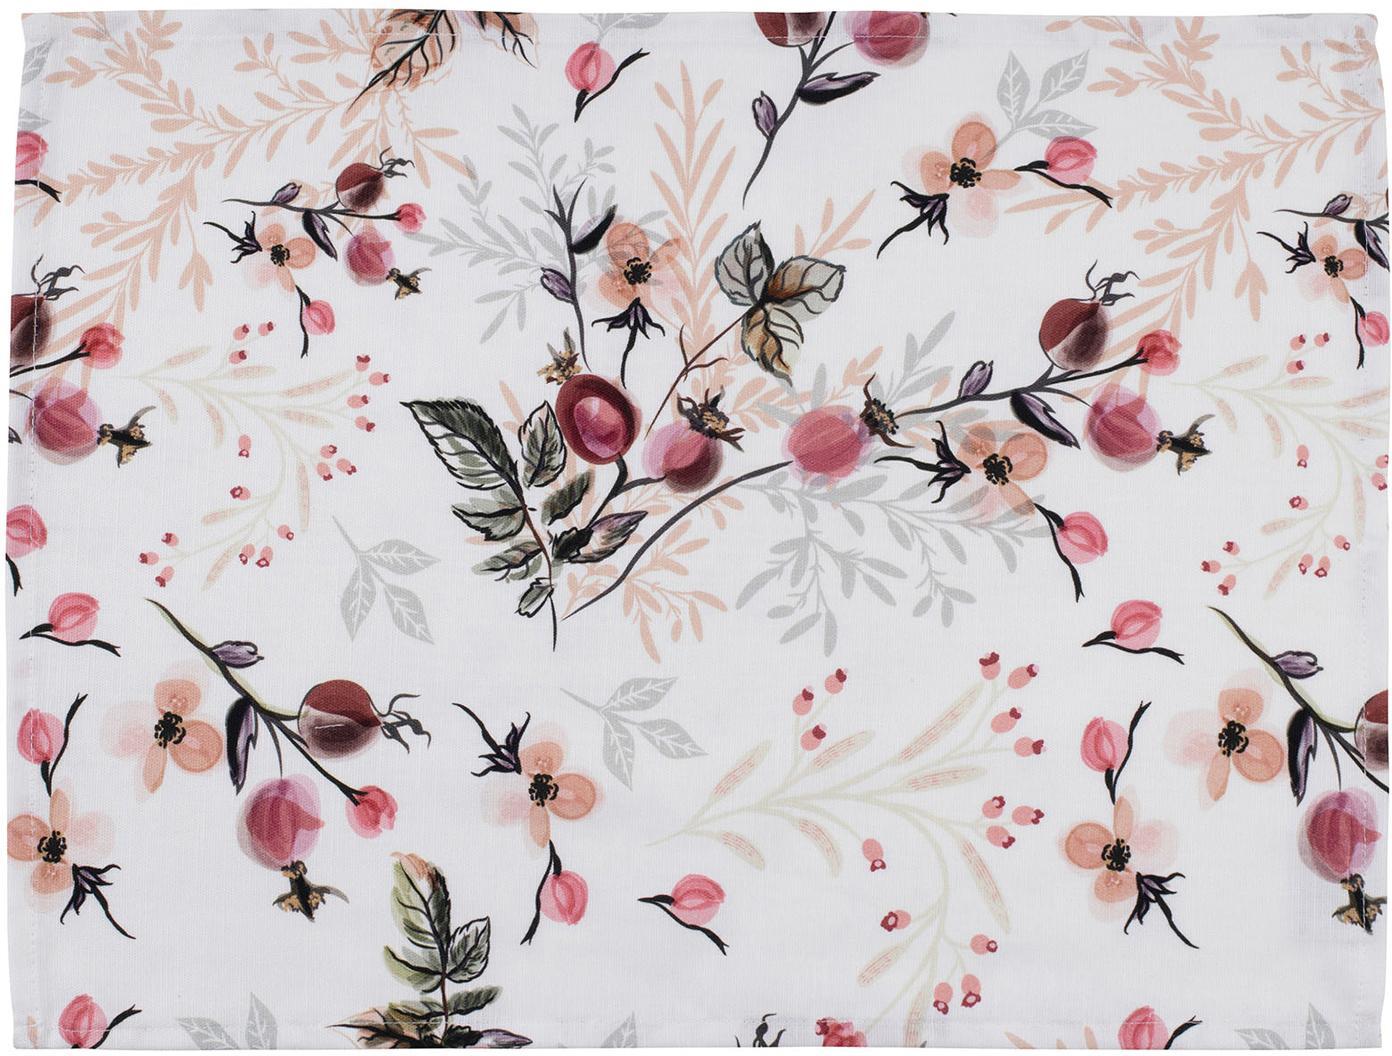 Manteles individuales Beas, 2uds., 100%algodón, Rosa, blanco, An 38 x L 50 cm